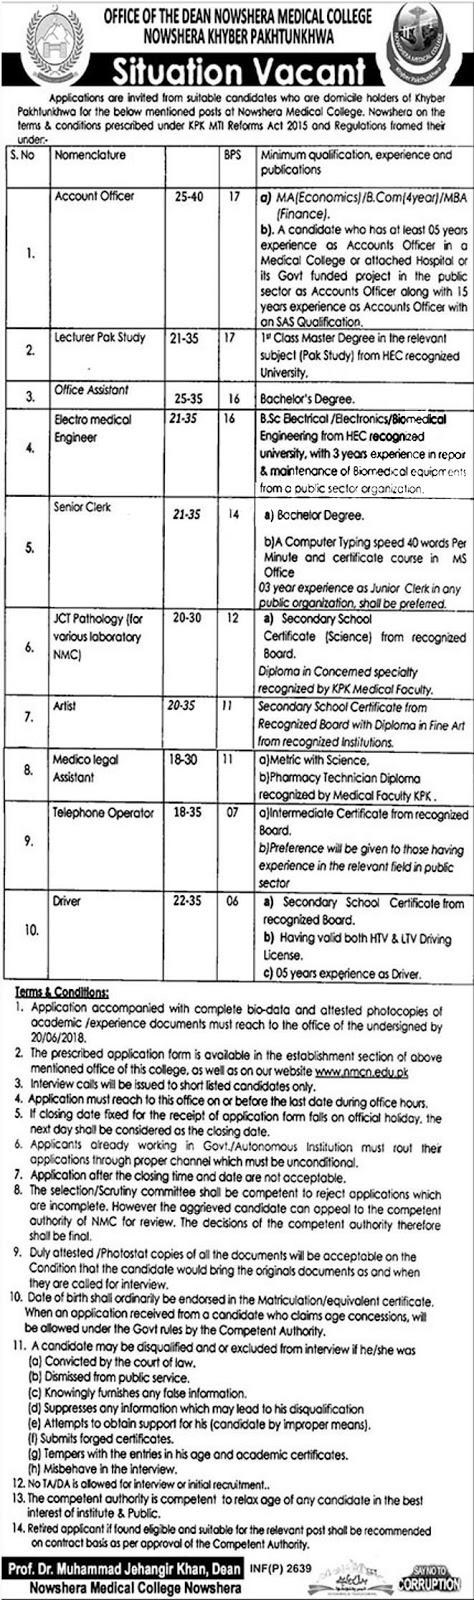 Office of The Dean Nowshera College June 2018 KPK Jobs